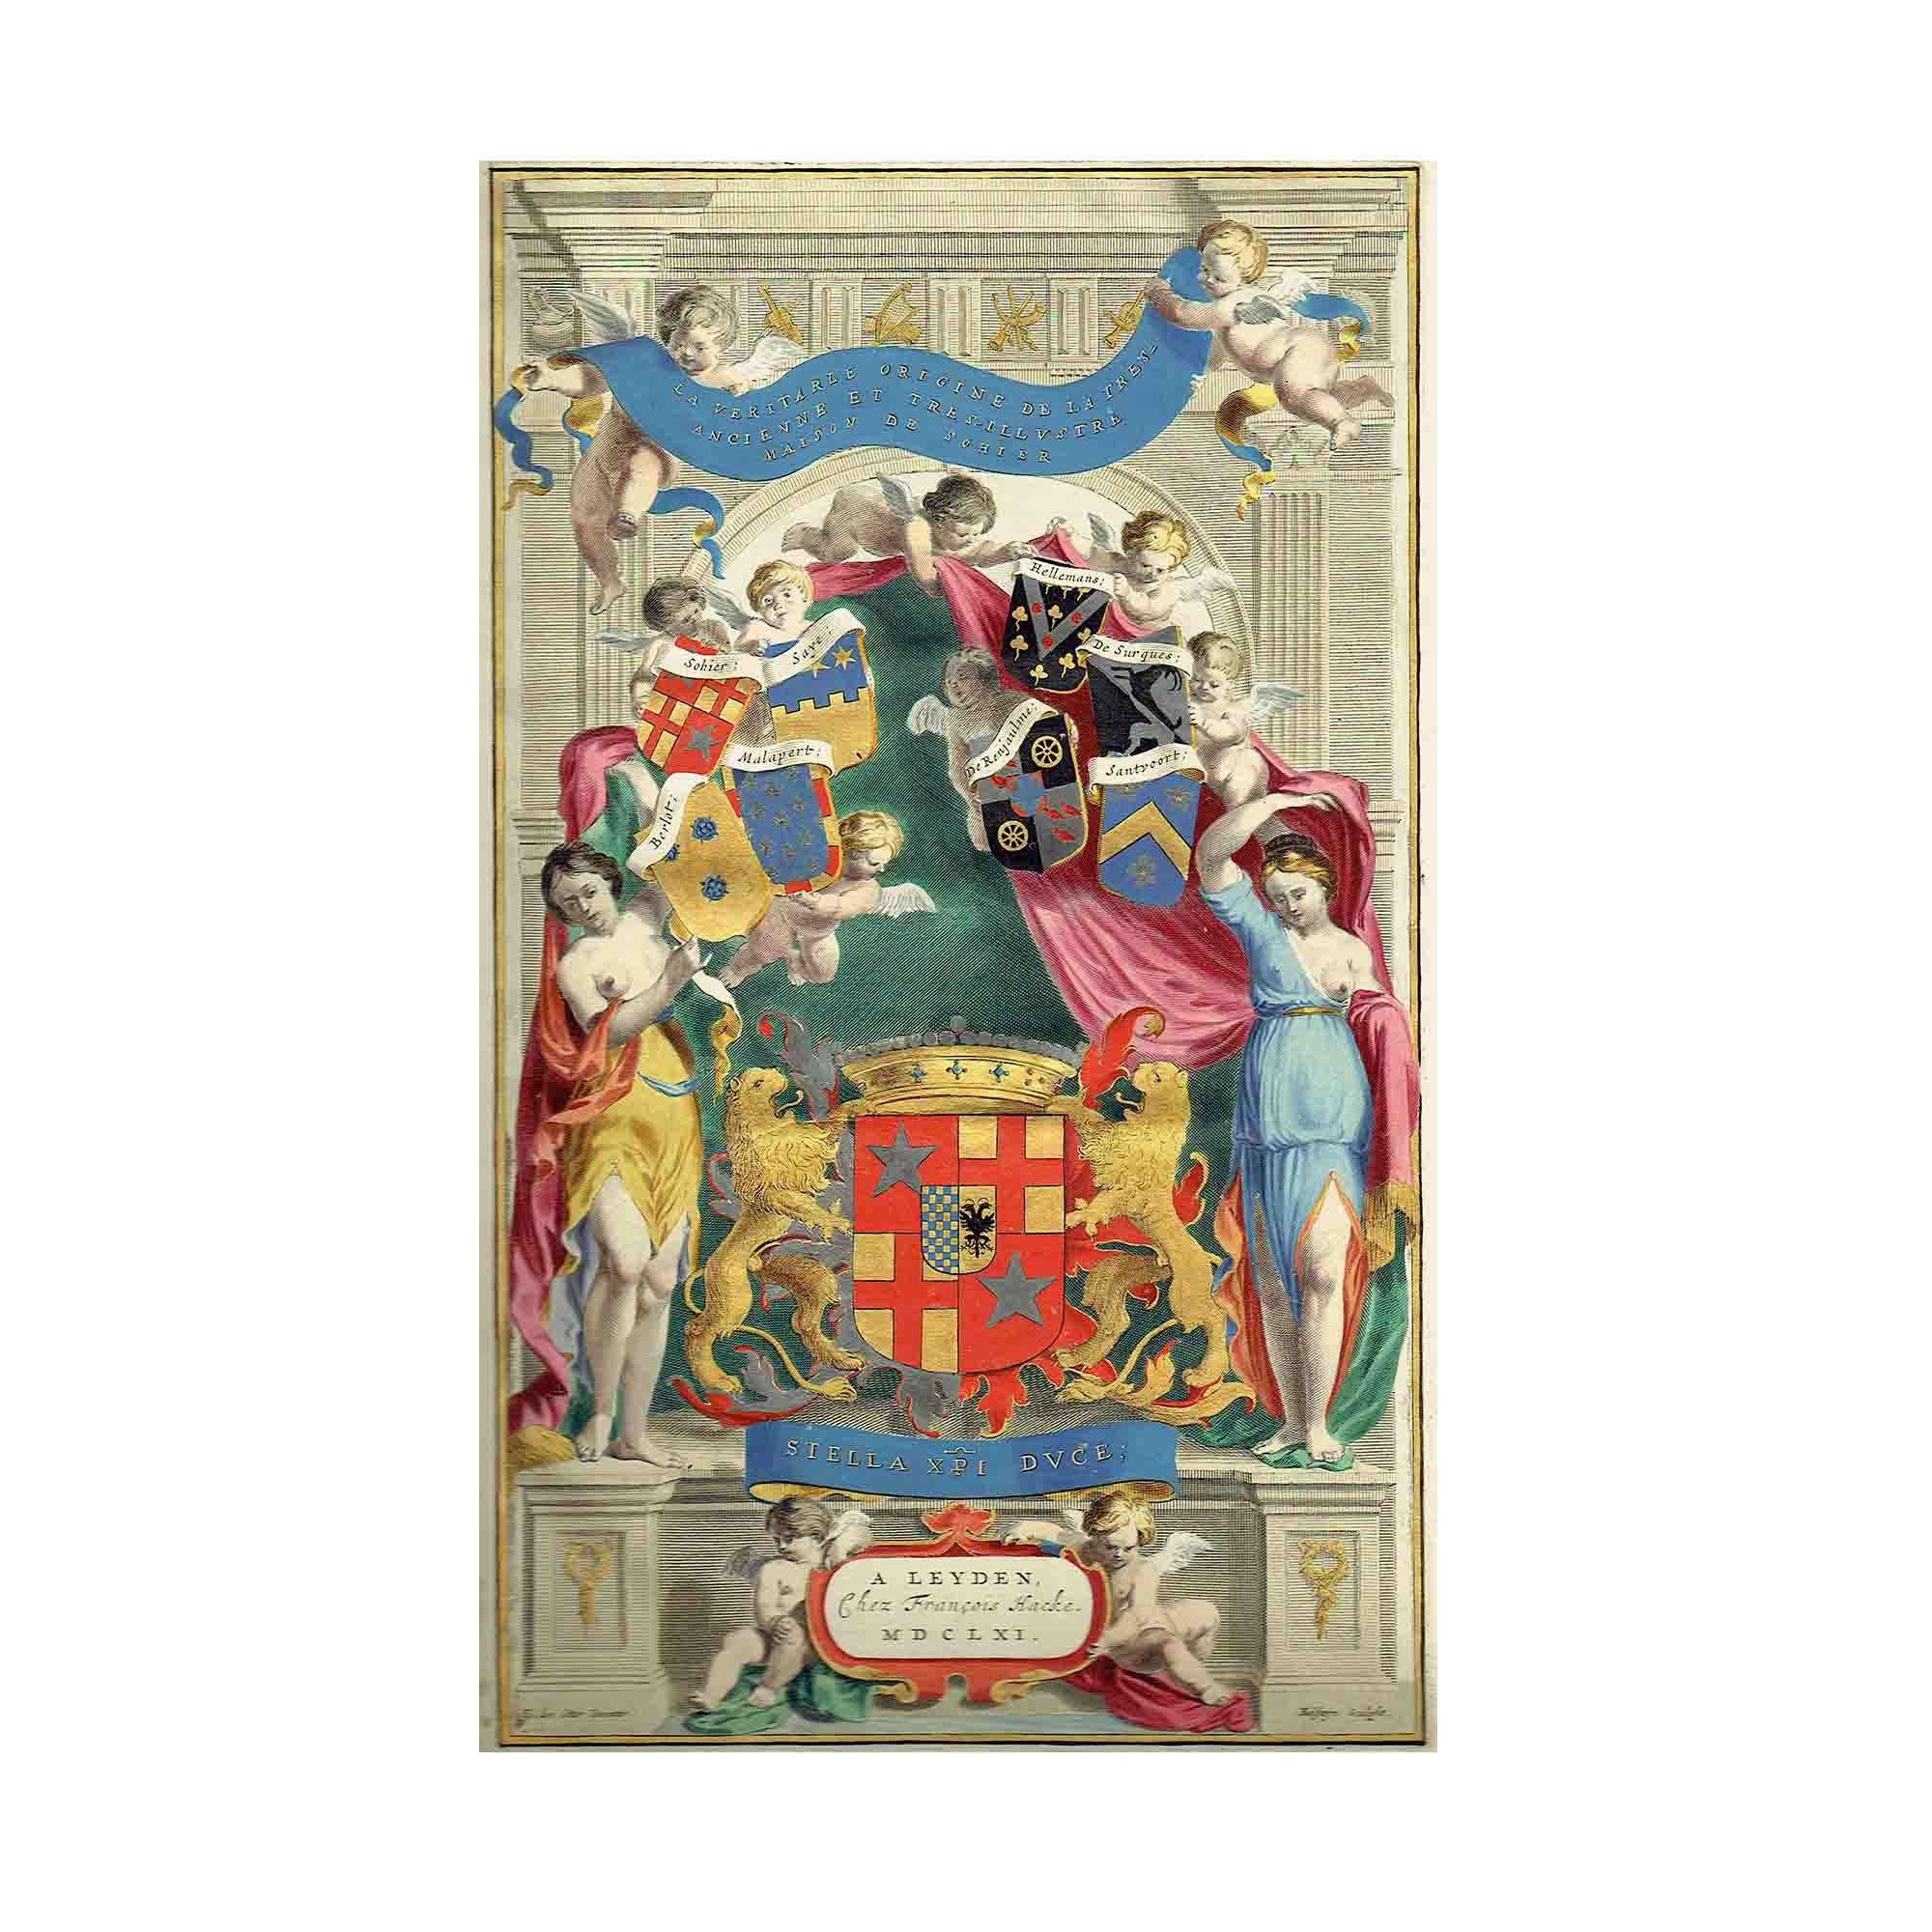 5301-Carpentier-Sohier-1661-Titel-N.jpg